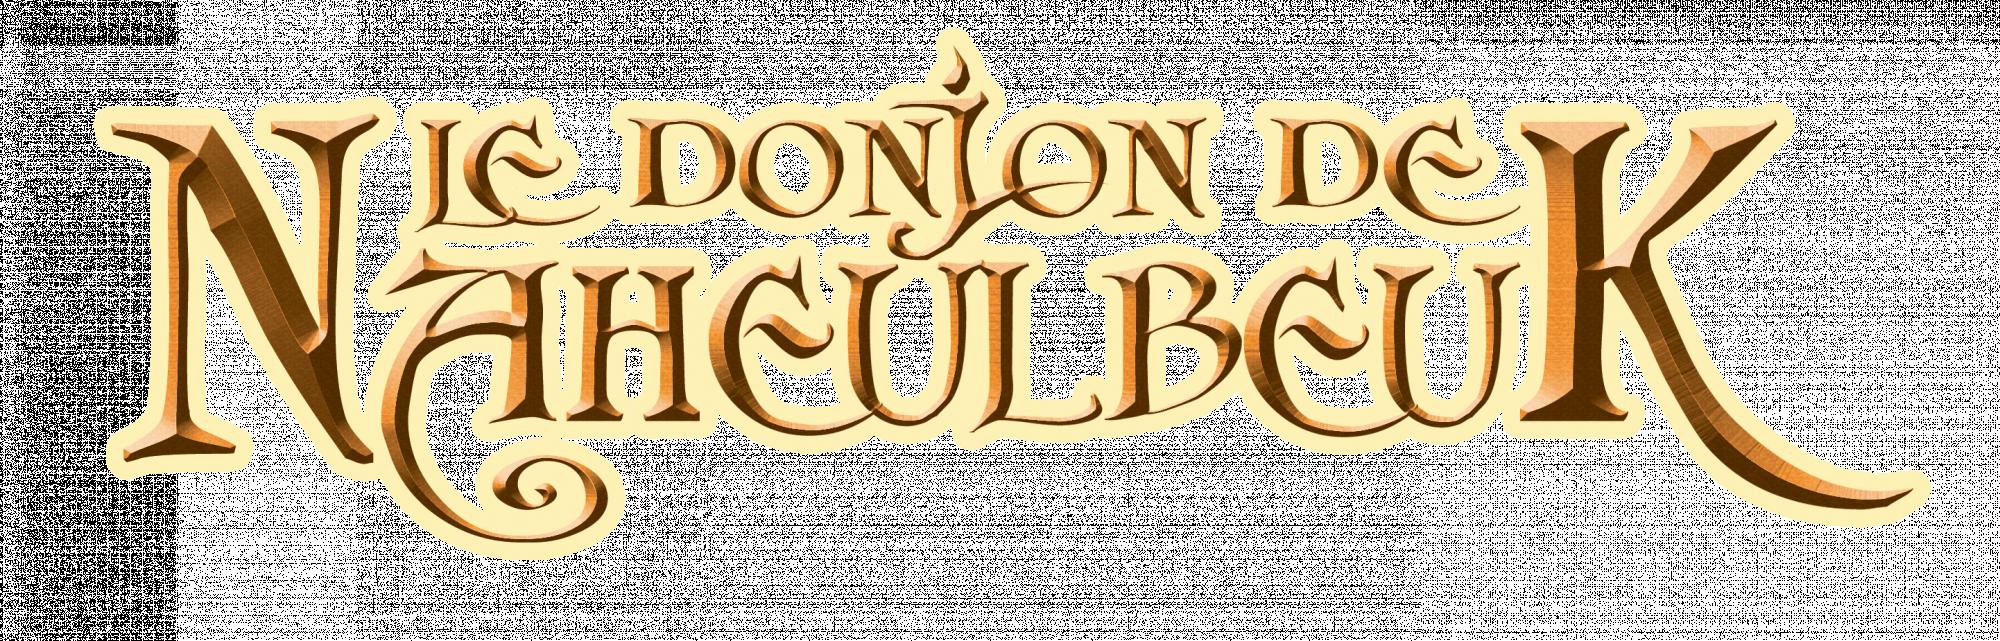 logo Le Donjon de Naheulbeuk